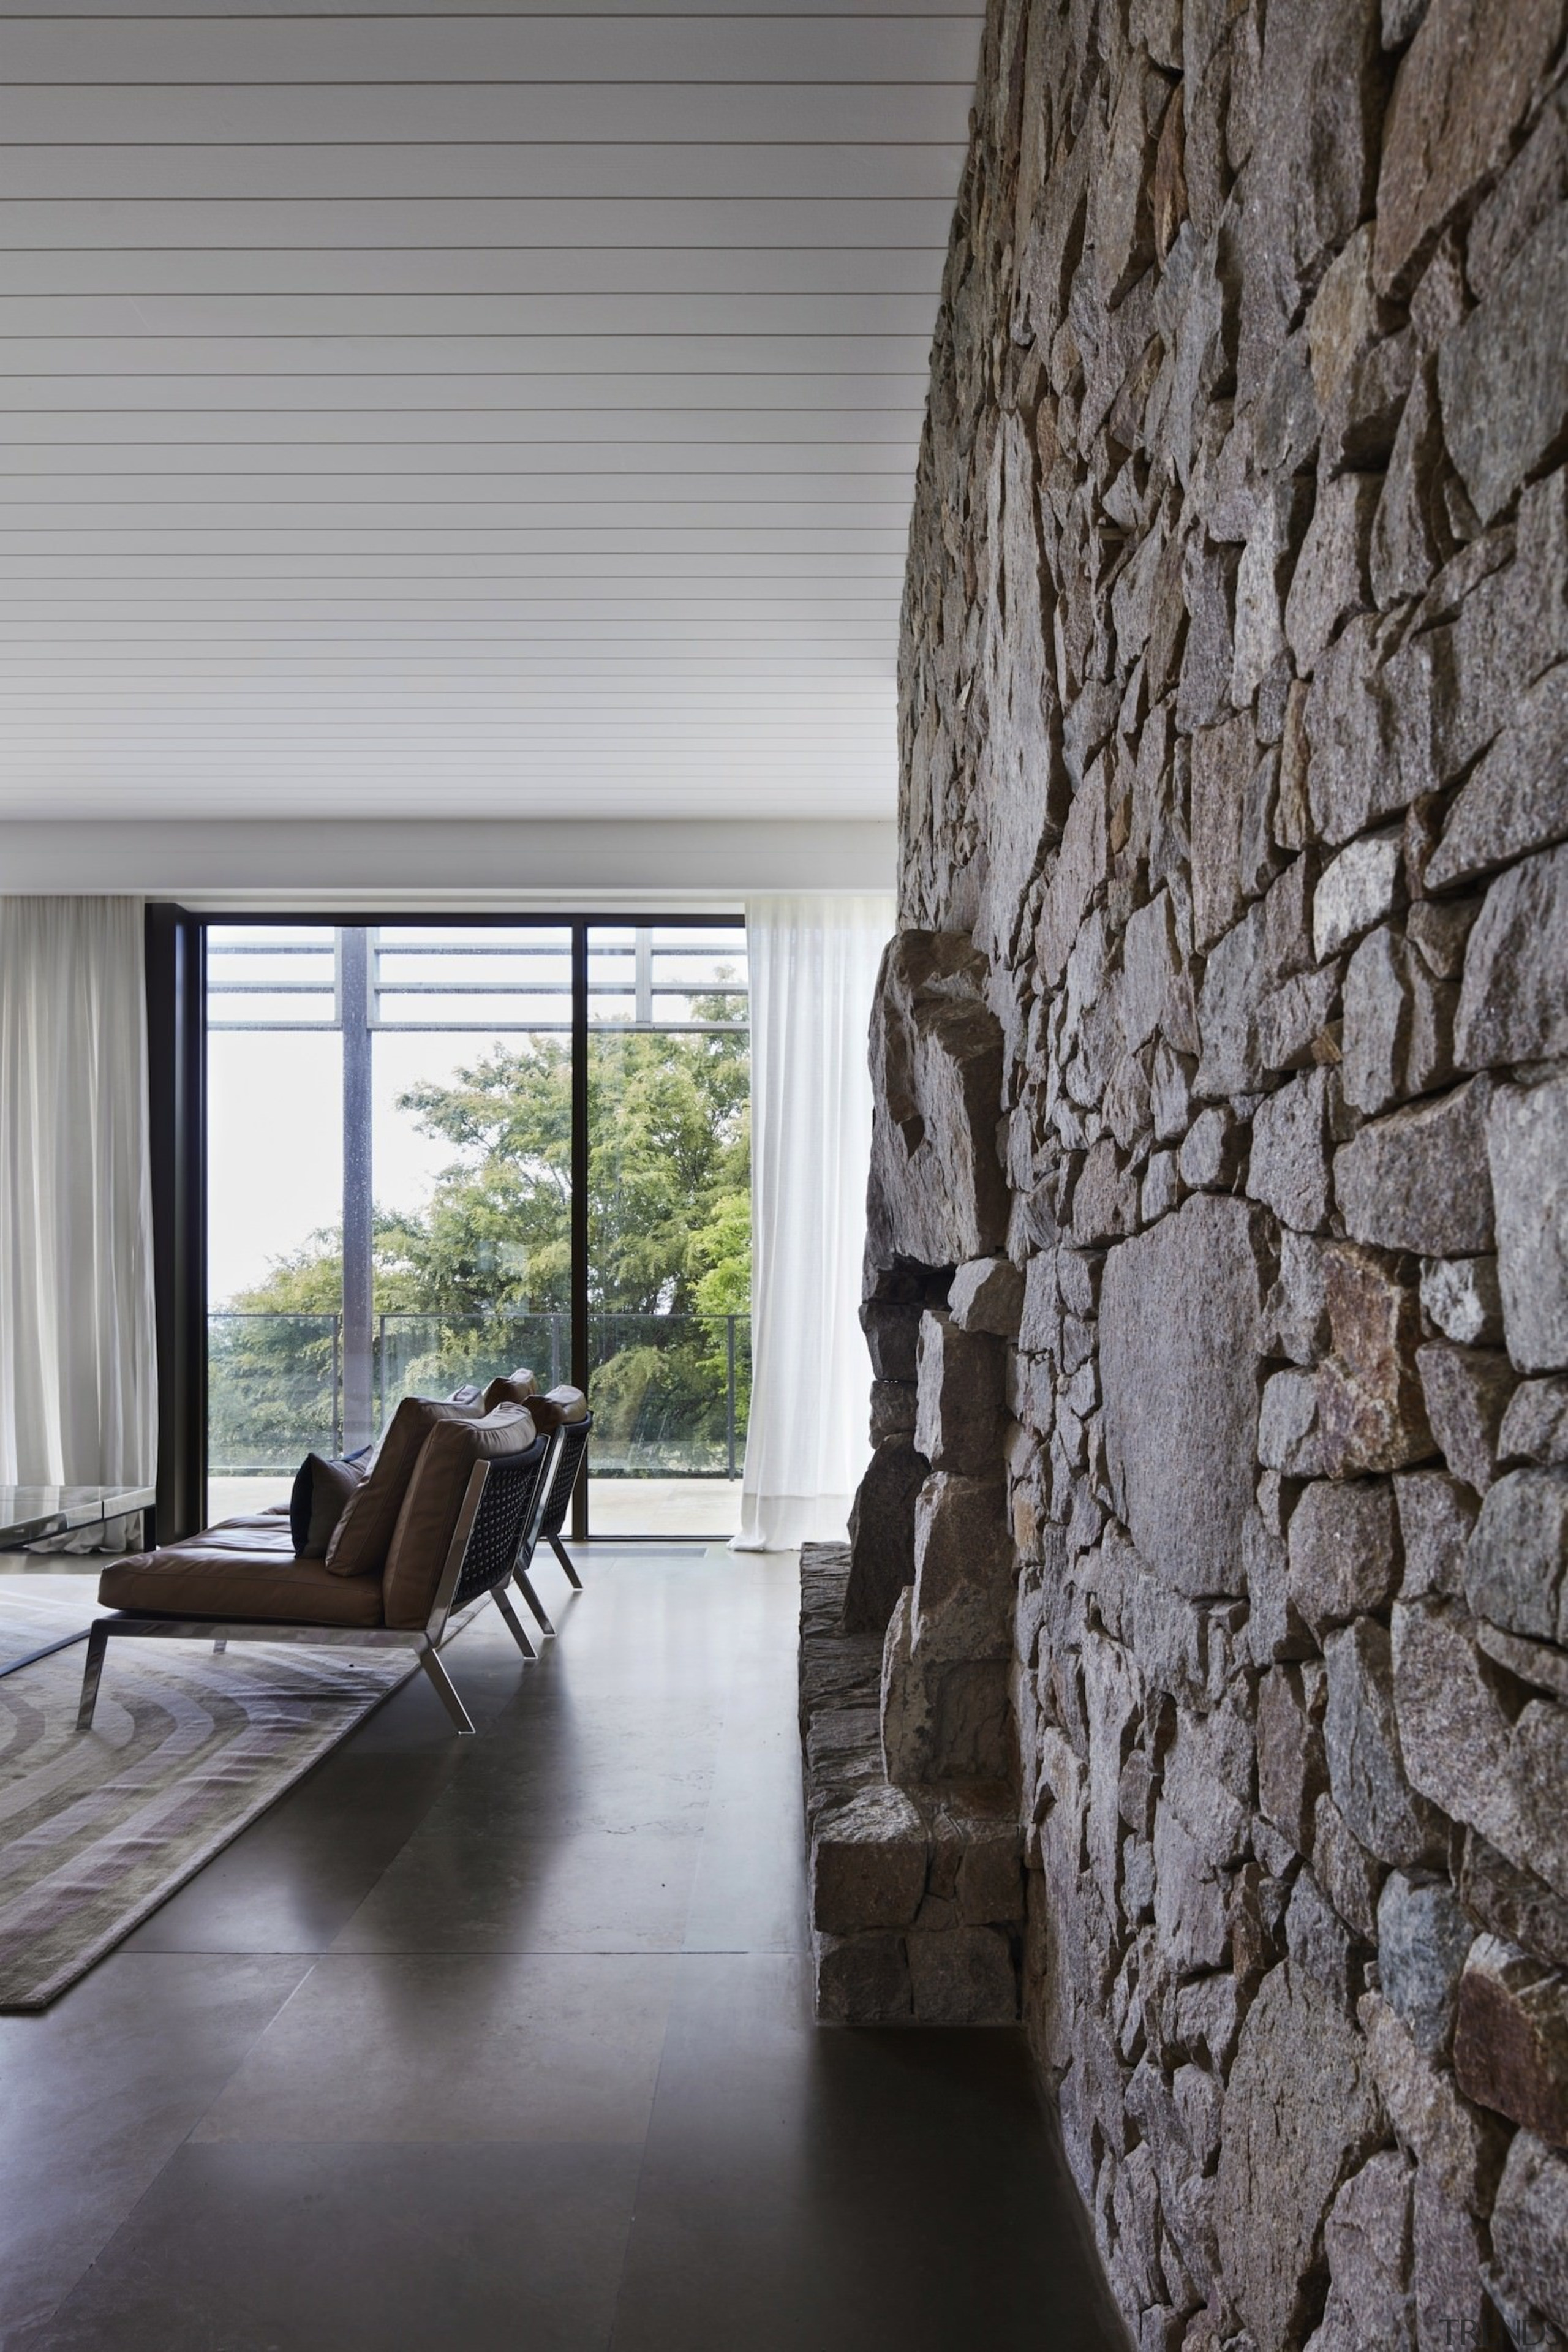 Architect: B.E Architecture architecture, floor, flooring, home, house, interior design, living room, wall, window, wood, gray, black